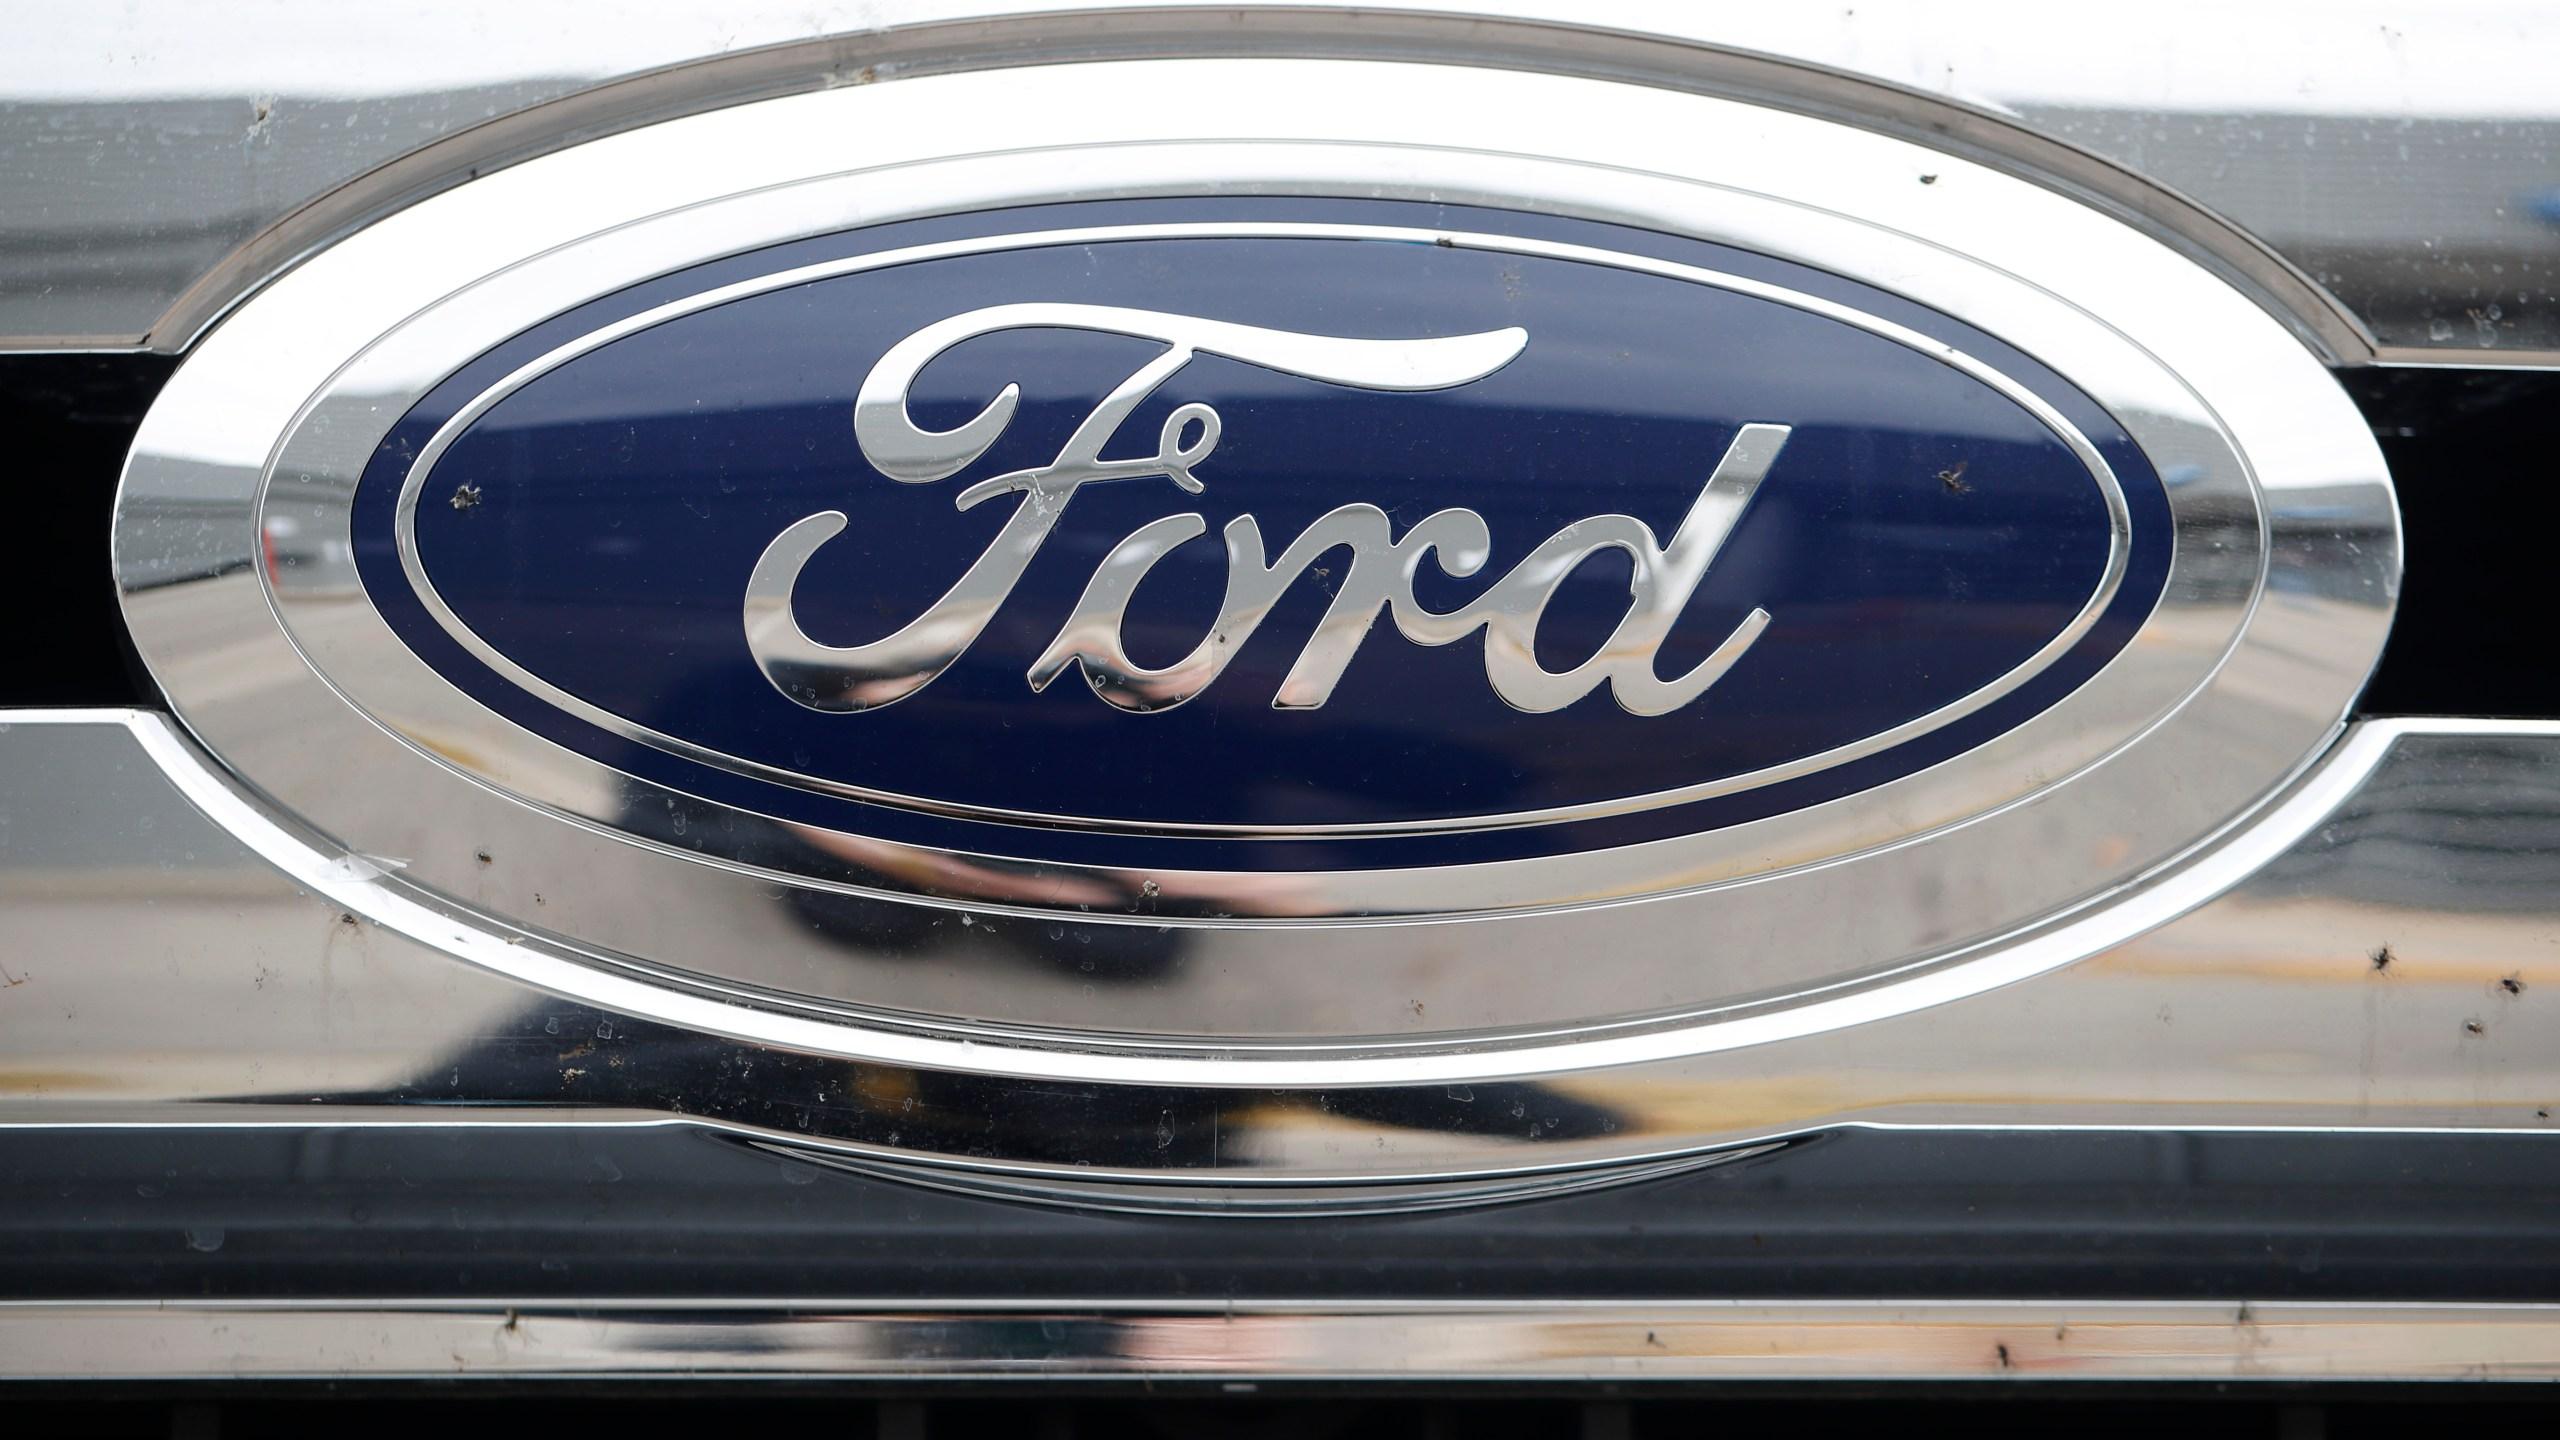 2019 Ford logo on F-250 pickup truck, r m